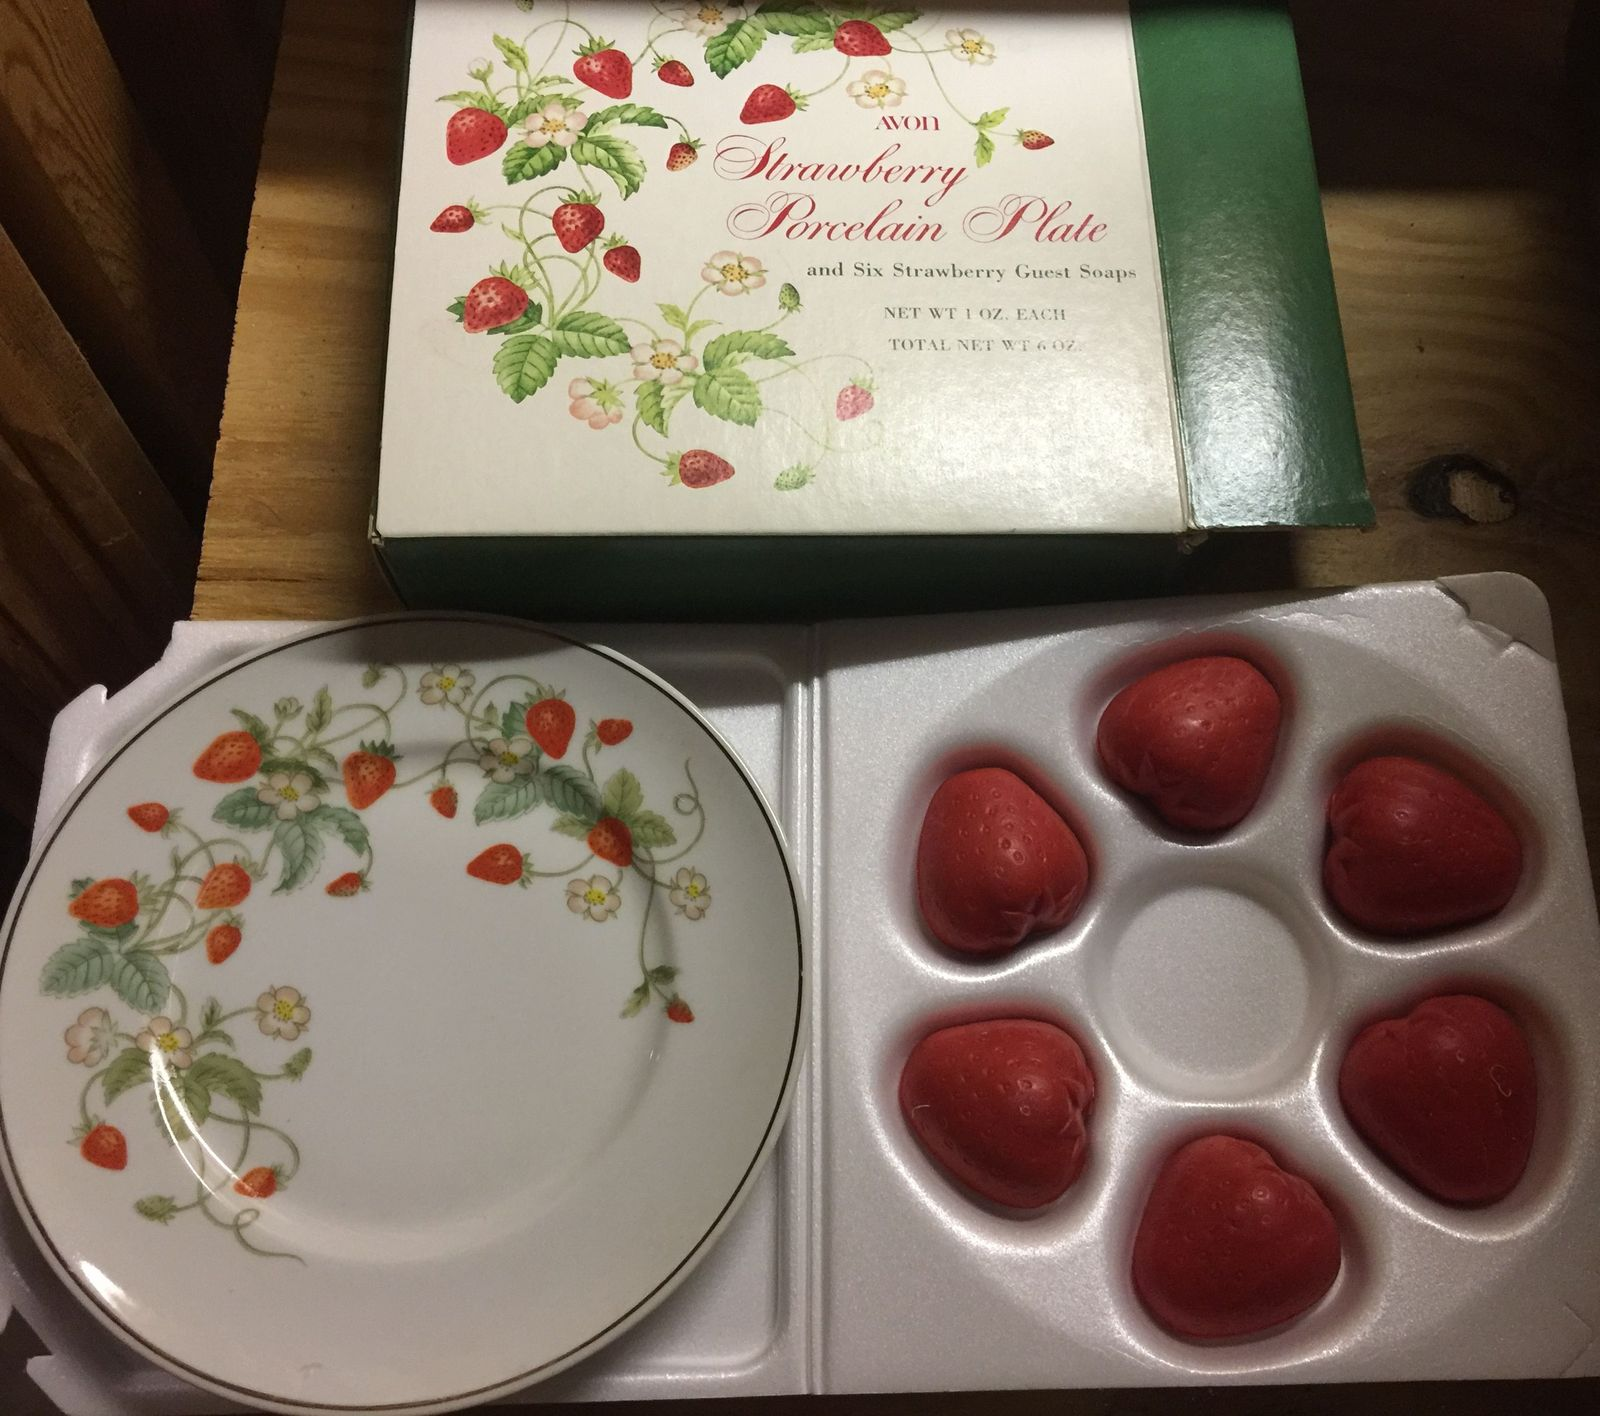 VTG 70s AVON Strawberry Porcelain 22K Gold Rimmed Collector's Plate/6 Soaps~NIB